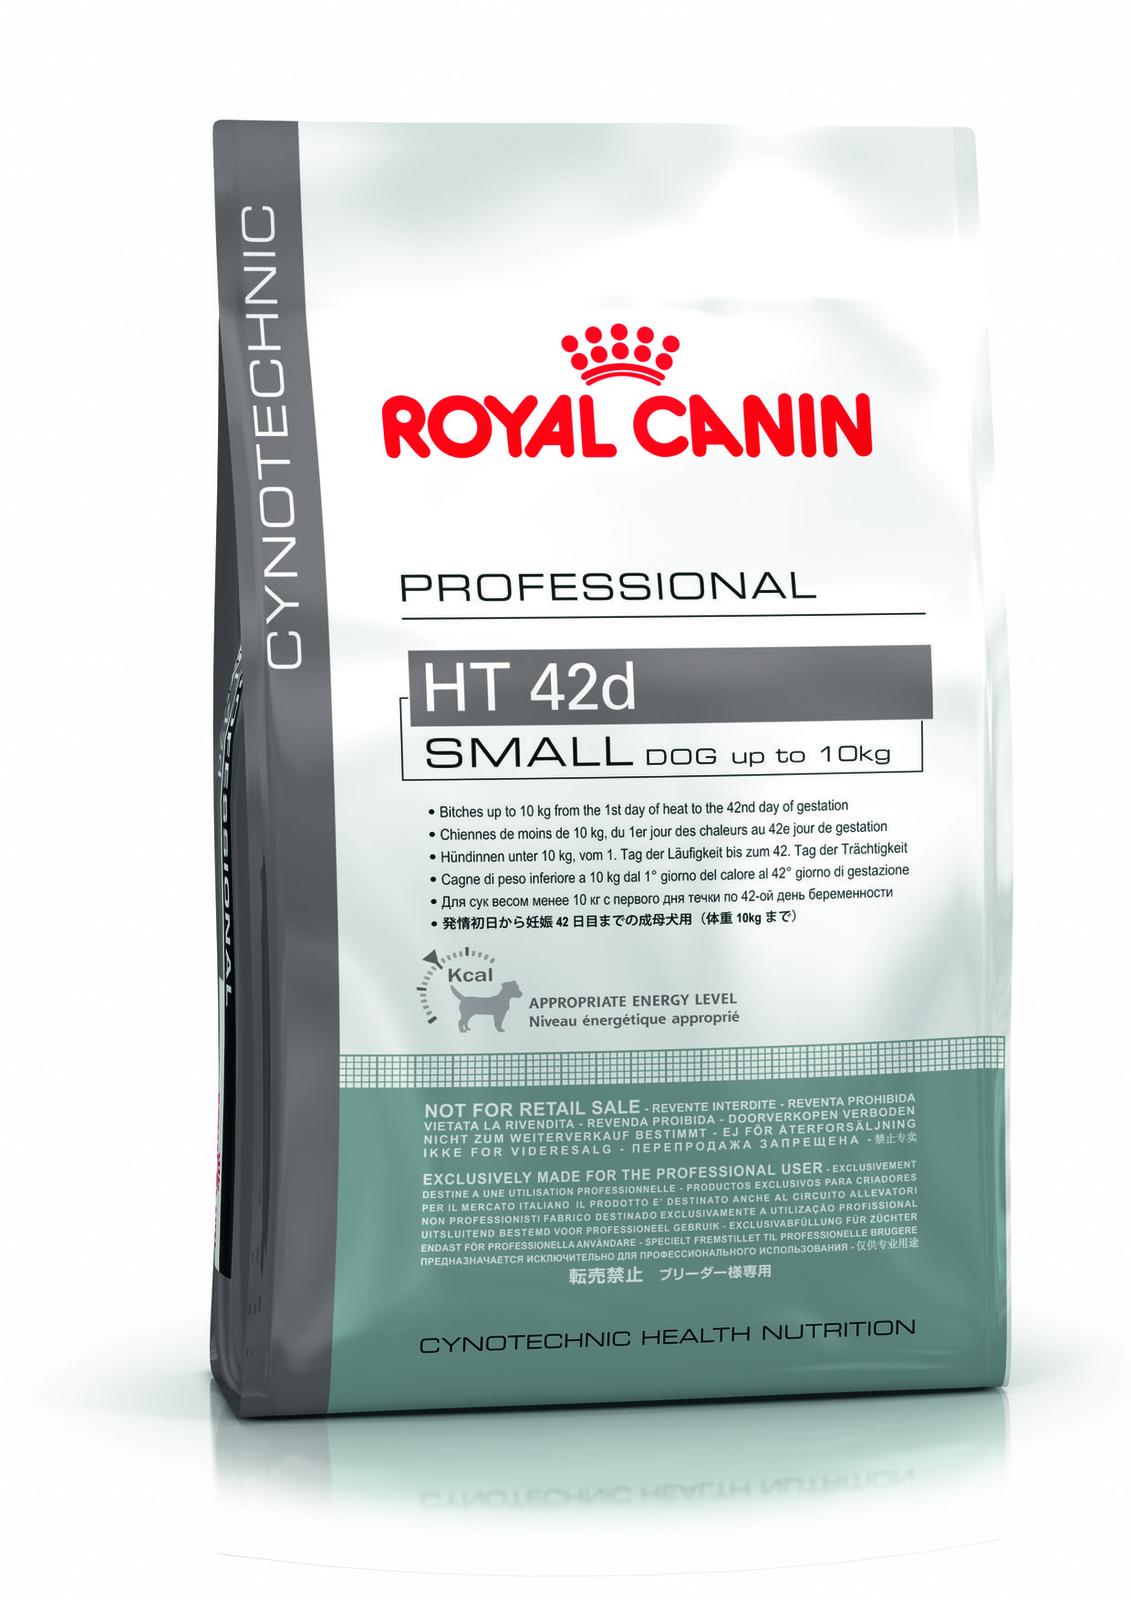 Royal Canin 174 Pro Ht 42d Small Dog Food